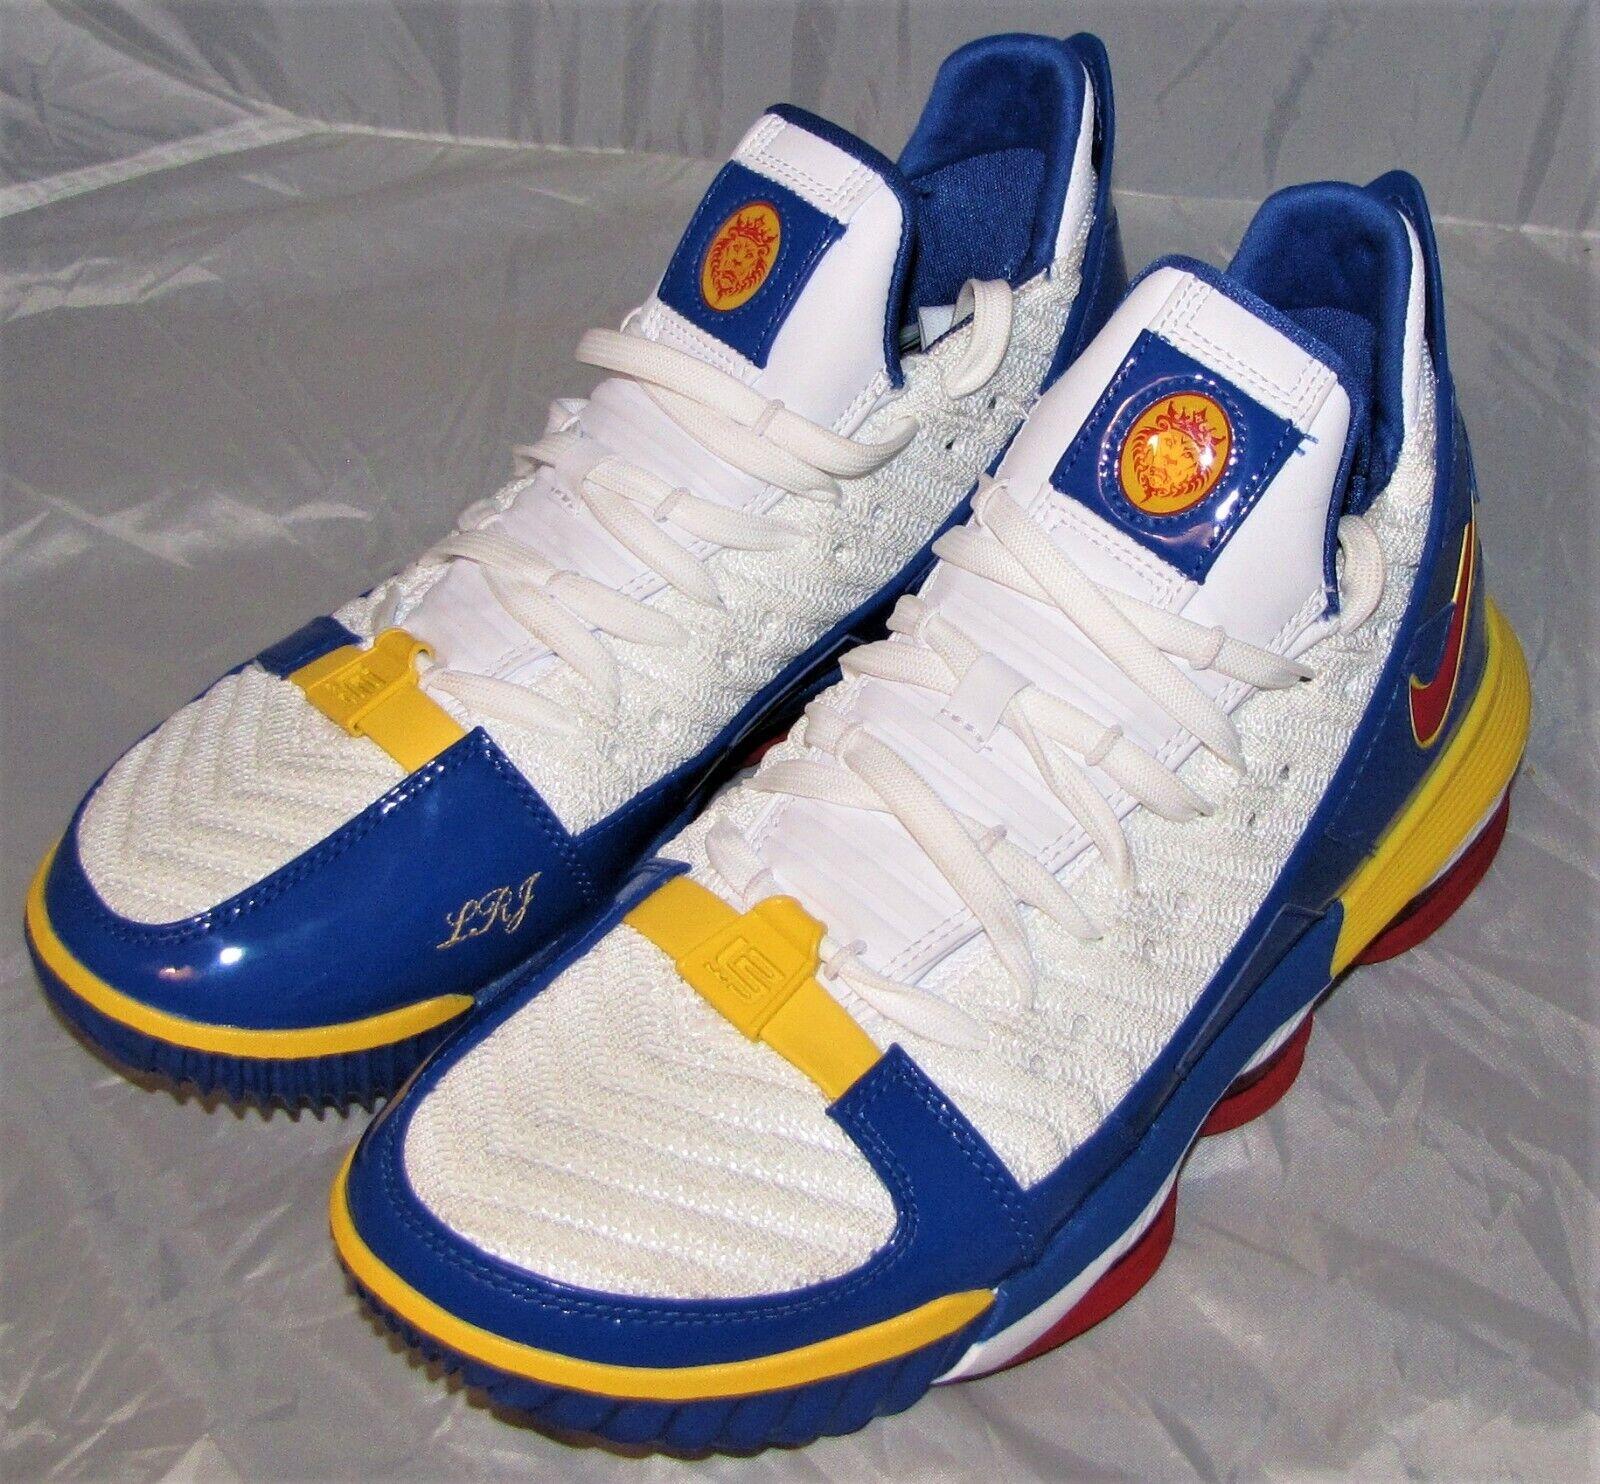 NIKE LEBRON  XVI SB SUPERBRON CD2451-100 Basketball shoes SIZE MEN 8.5 NEW NBA